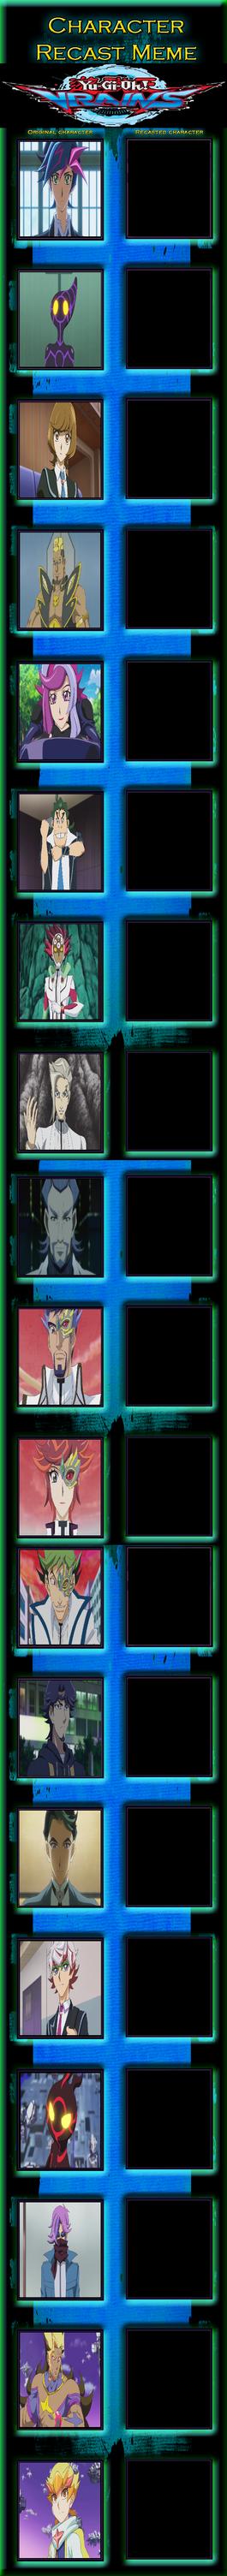 Yu-Gi-Oh! VRAINS Recast Meme by MarioFanProductions